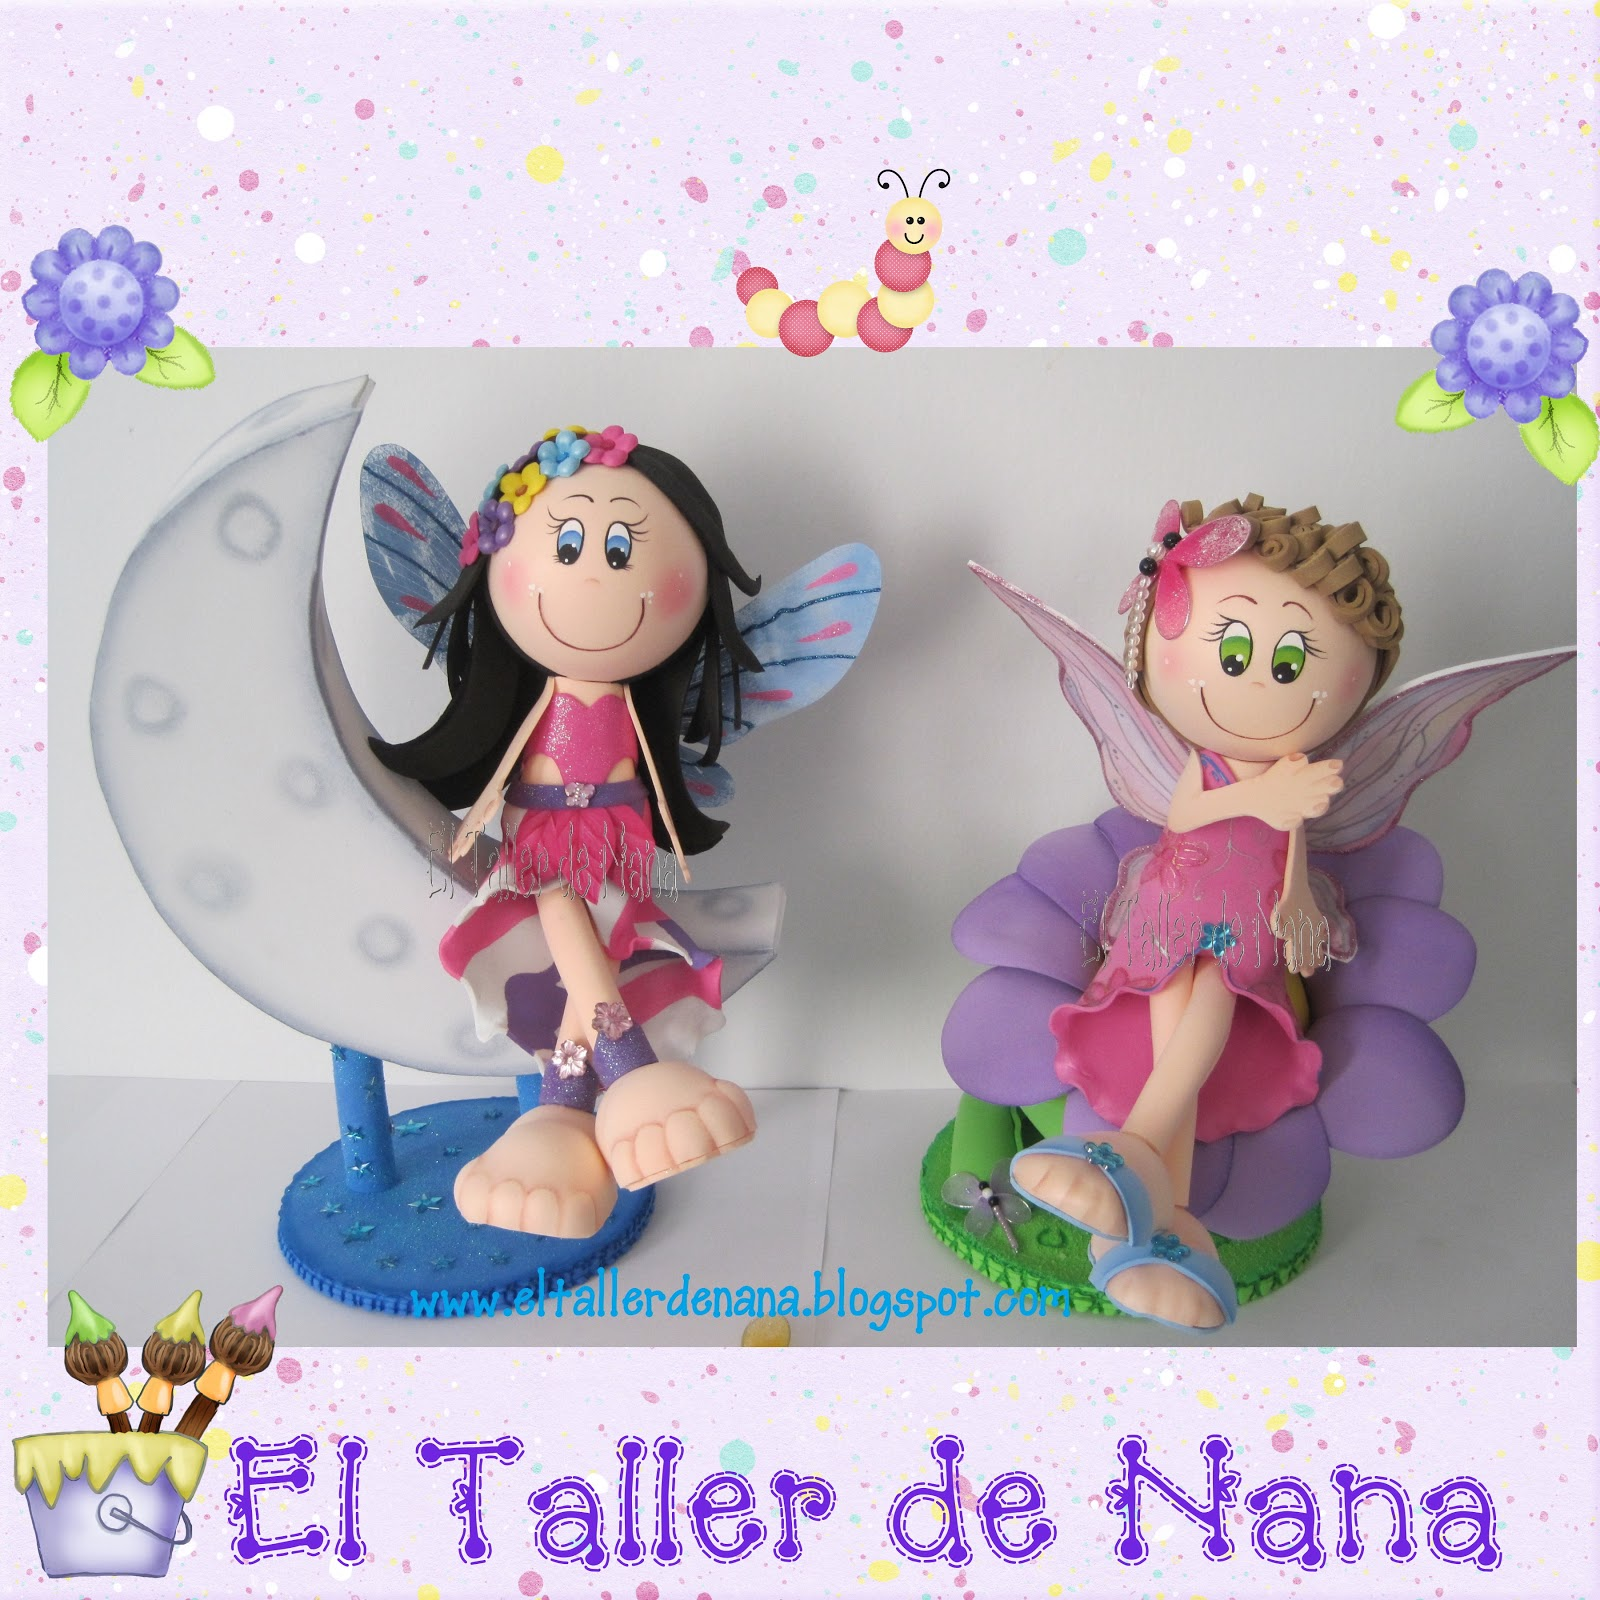 El Taller de Nana: noviembre 2012